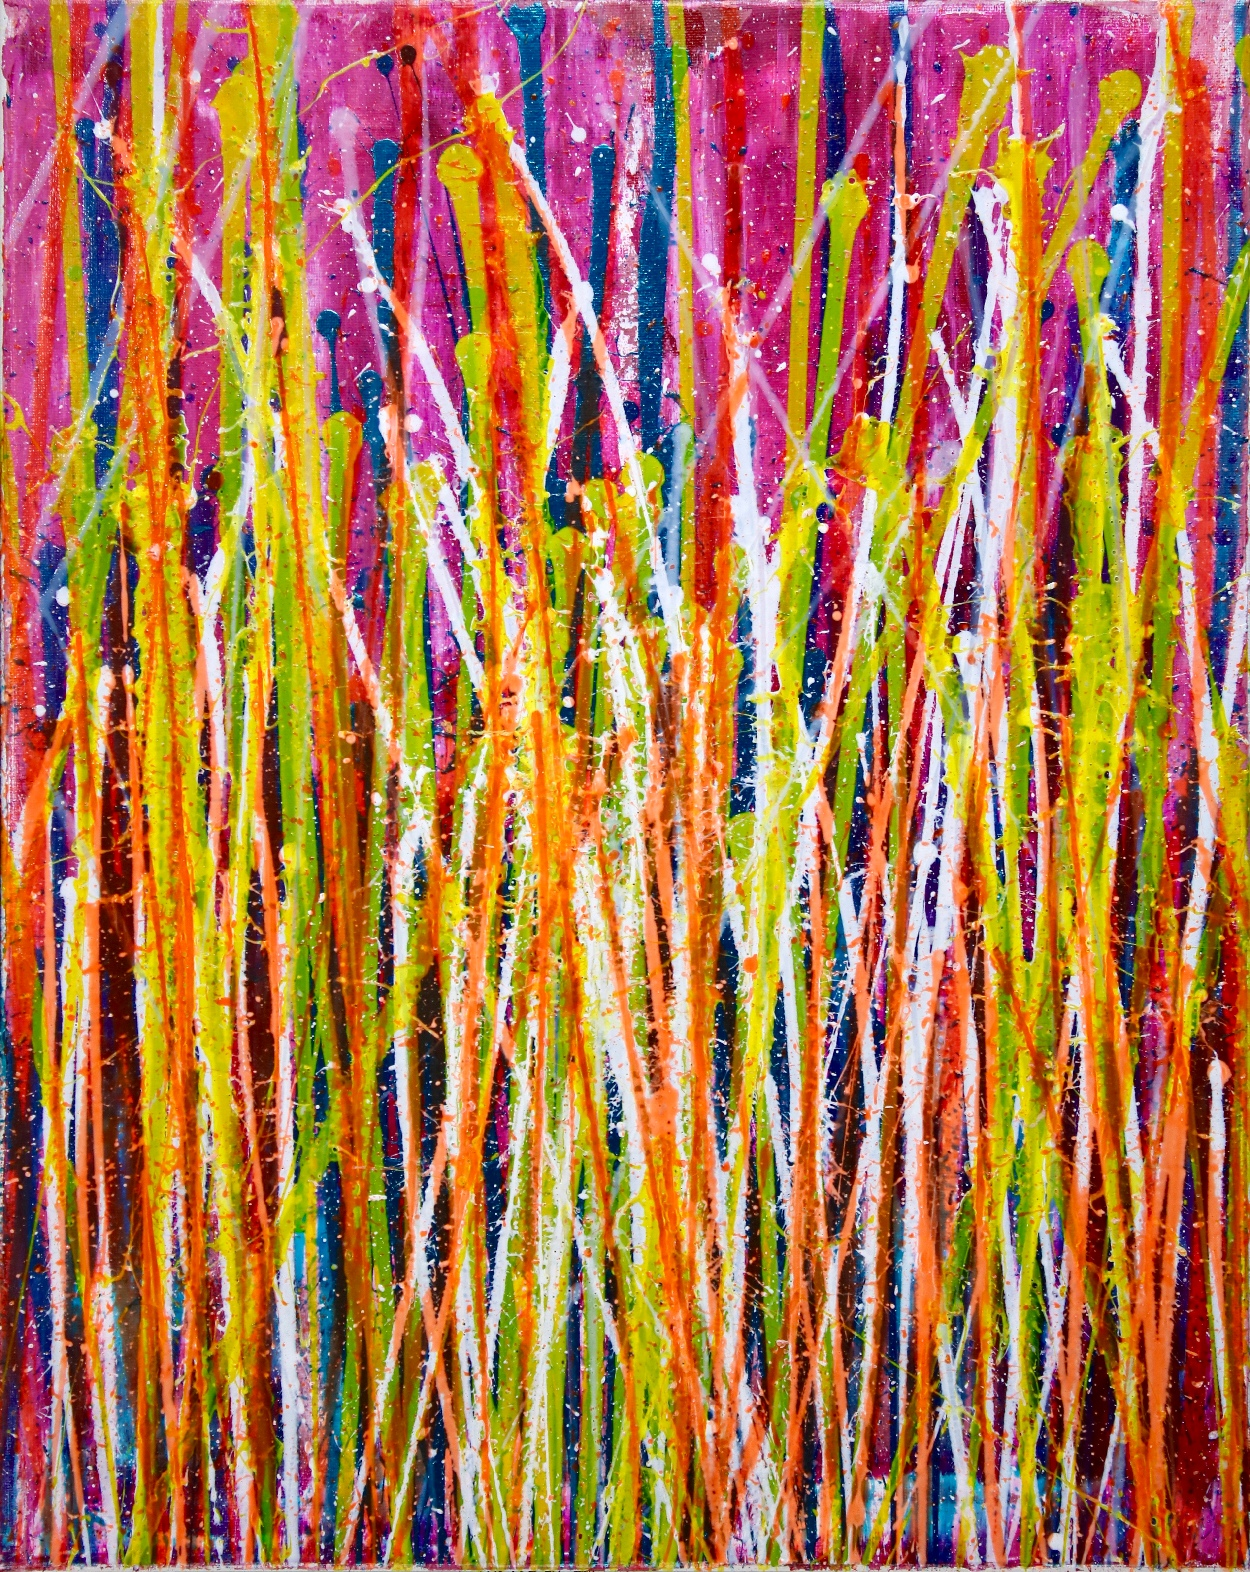 Daydream (Chaos Garden) by Nestor Toro – SOLD